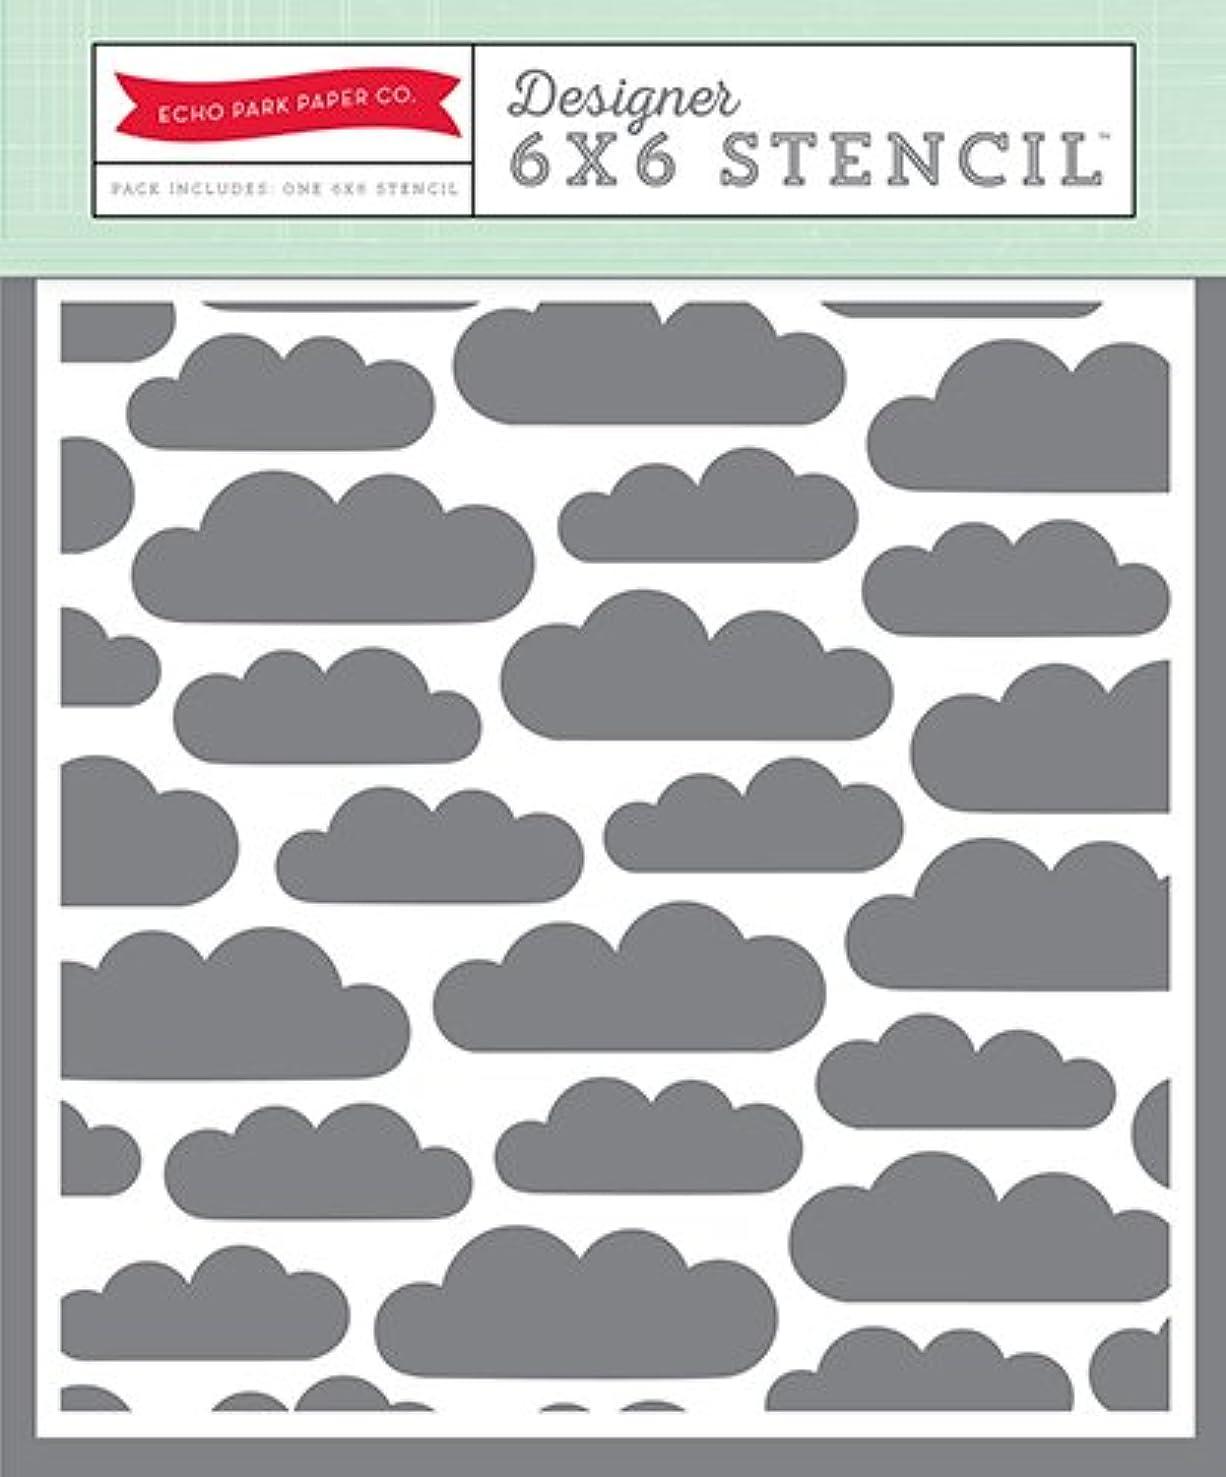 Echo Park Paper Company Clouds Stencil